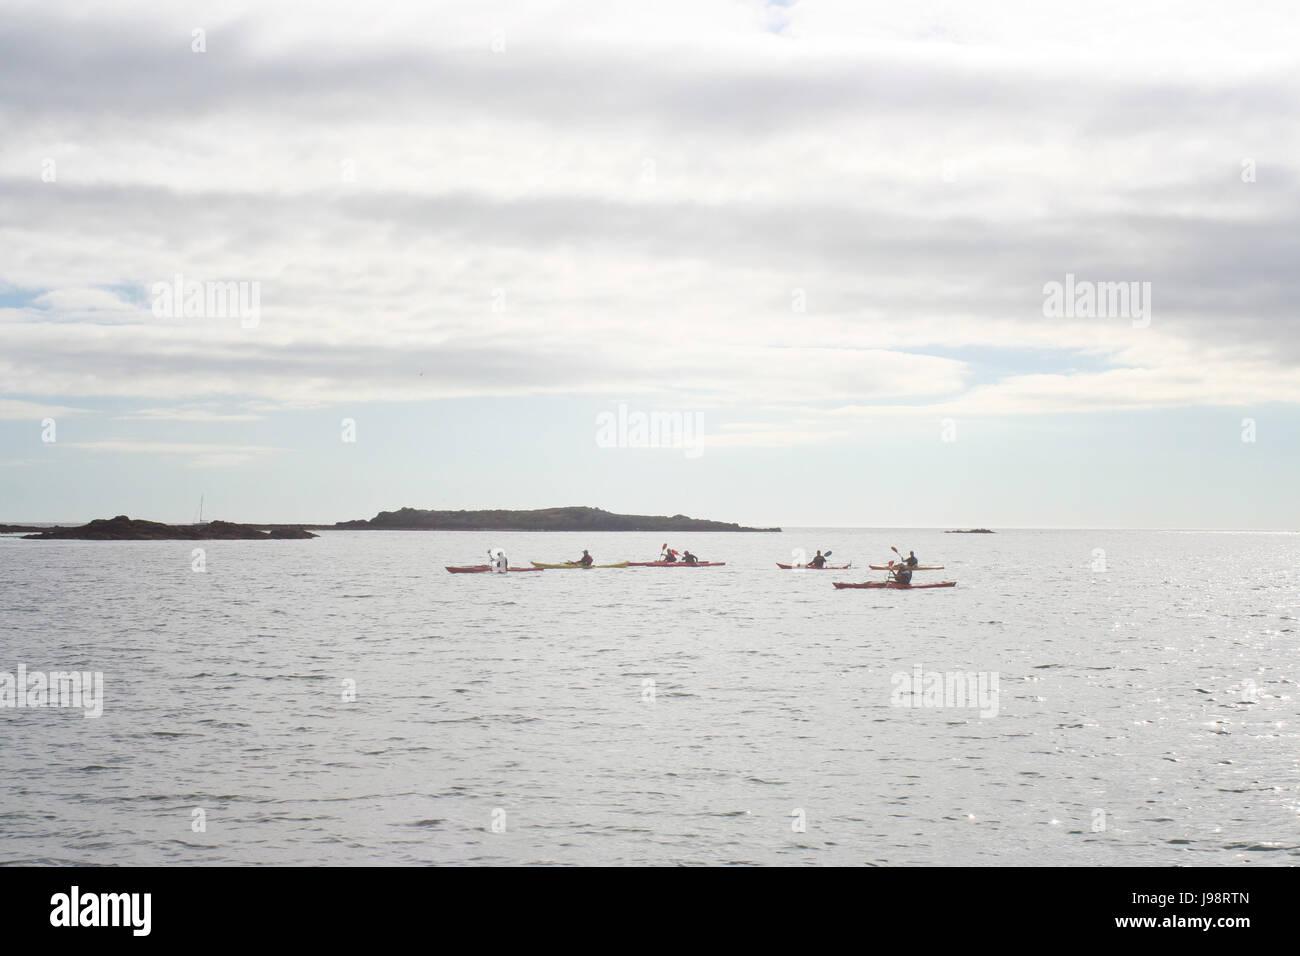 Grupo kayak en la Bahía de Dublín, Irlanda Foto de stock